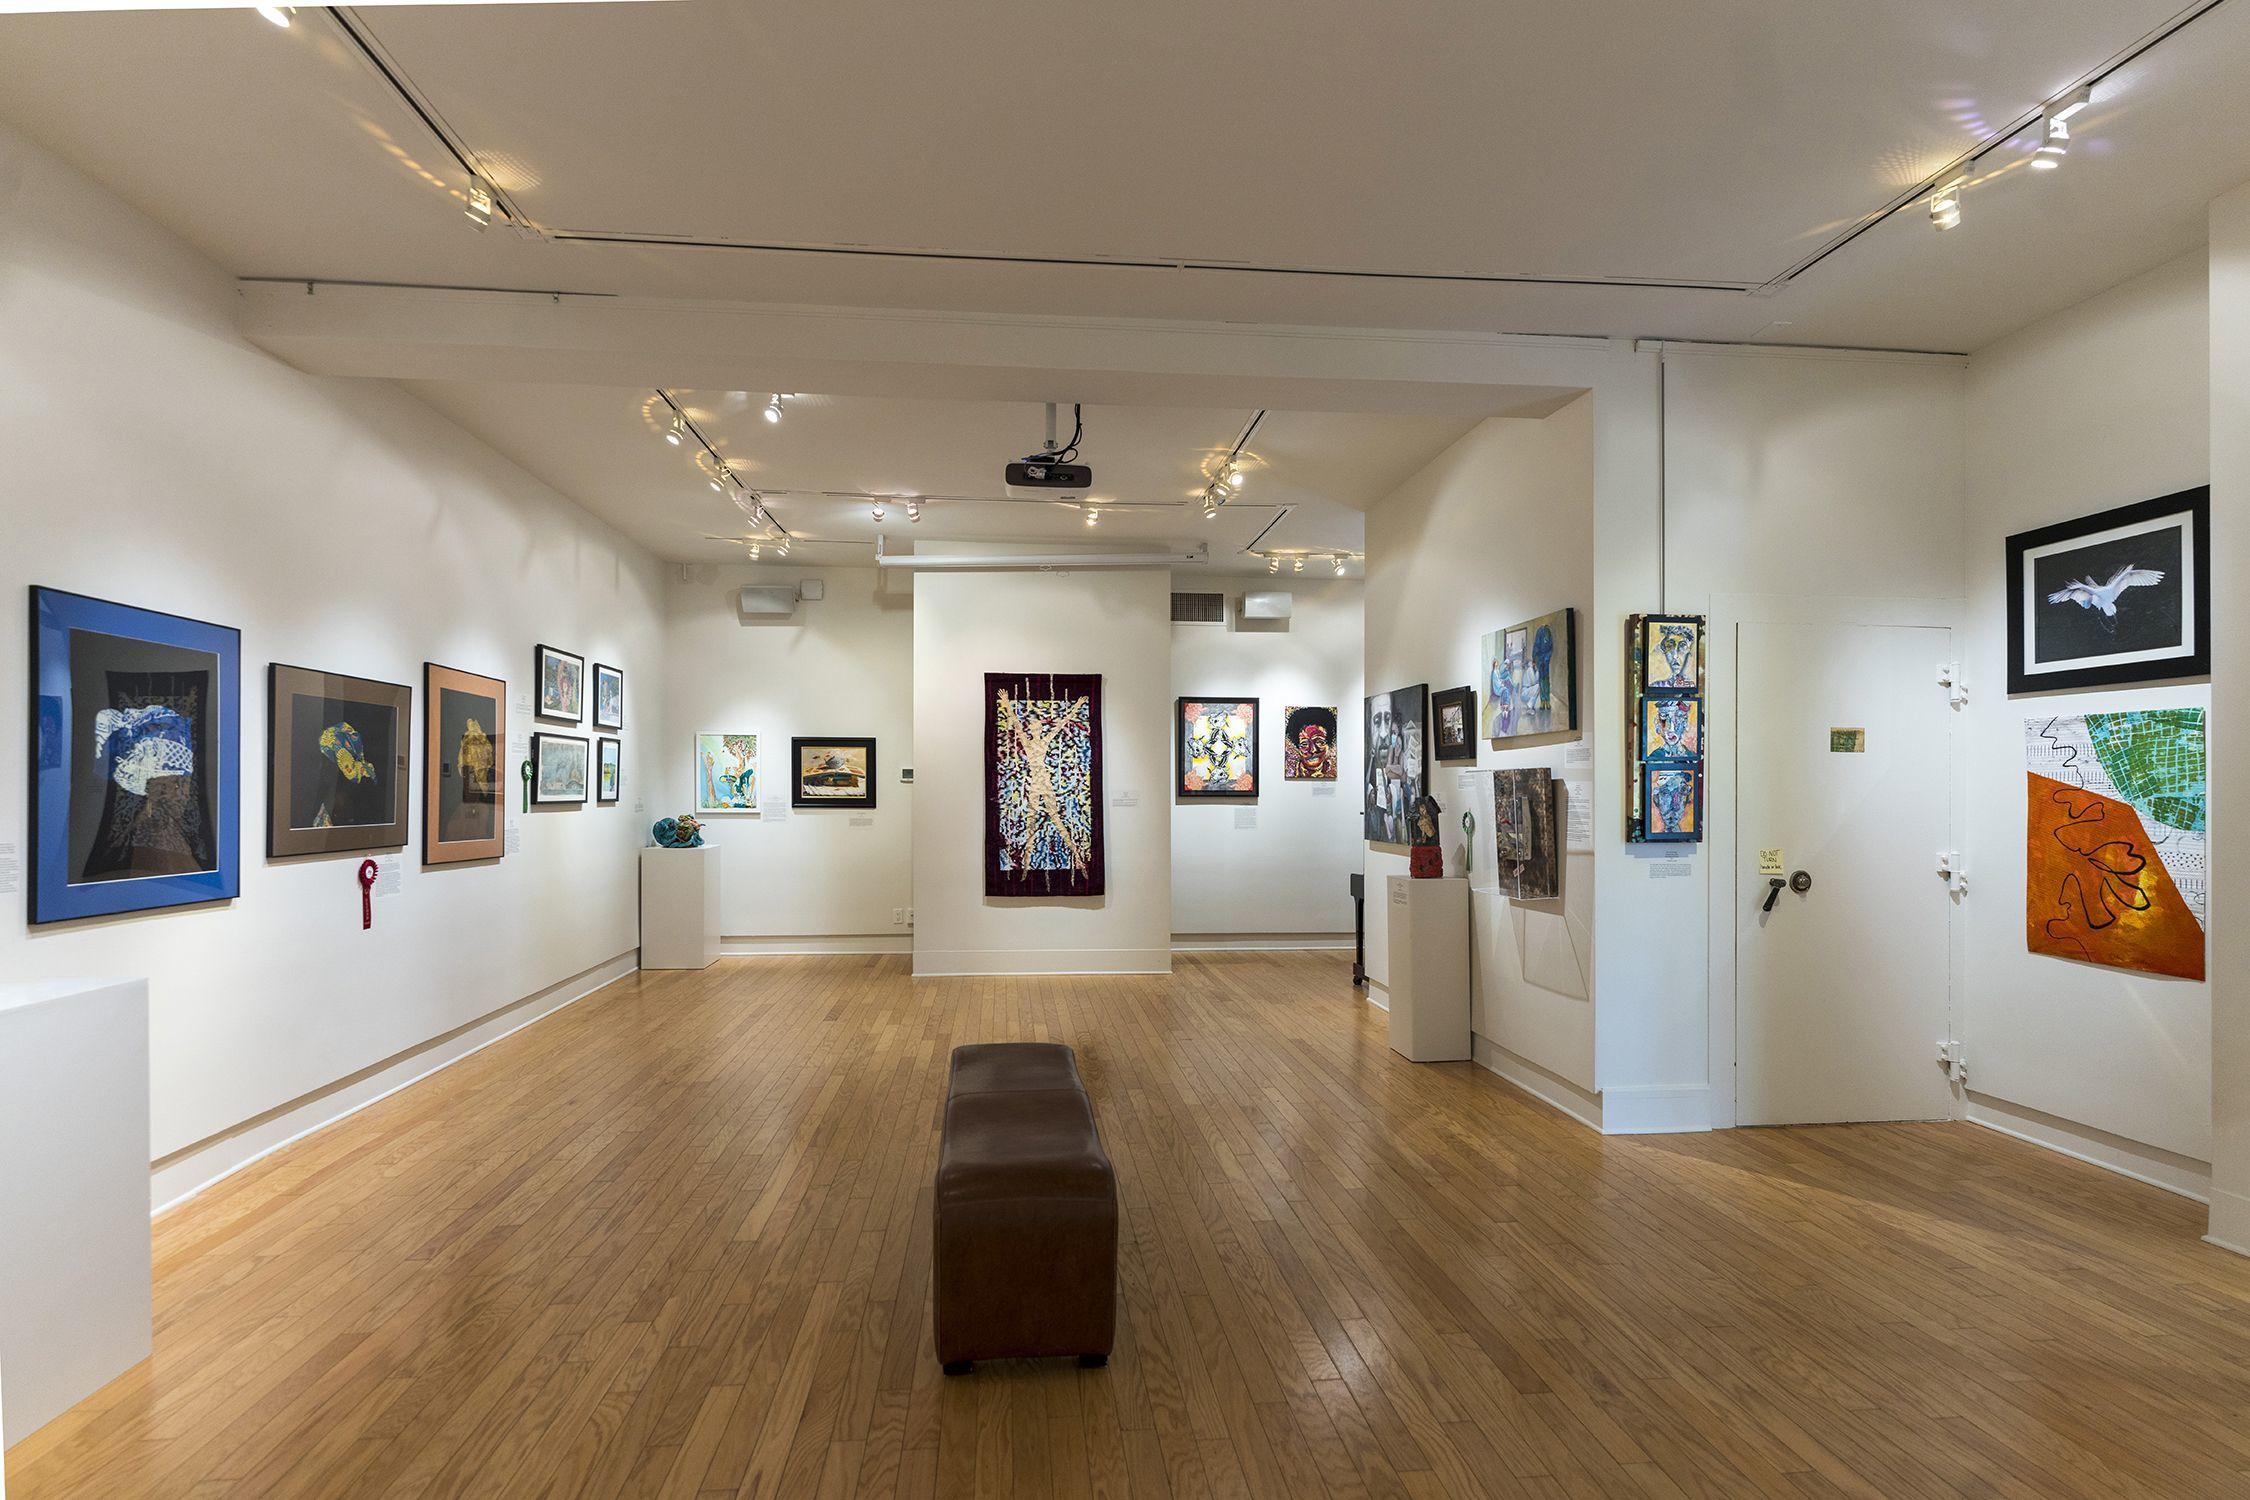 31st Annual All Florida Juried Art Show